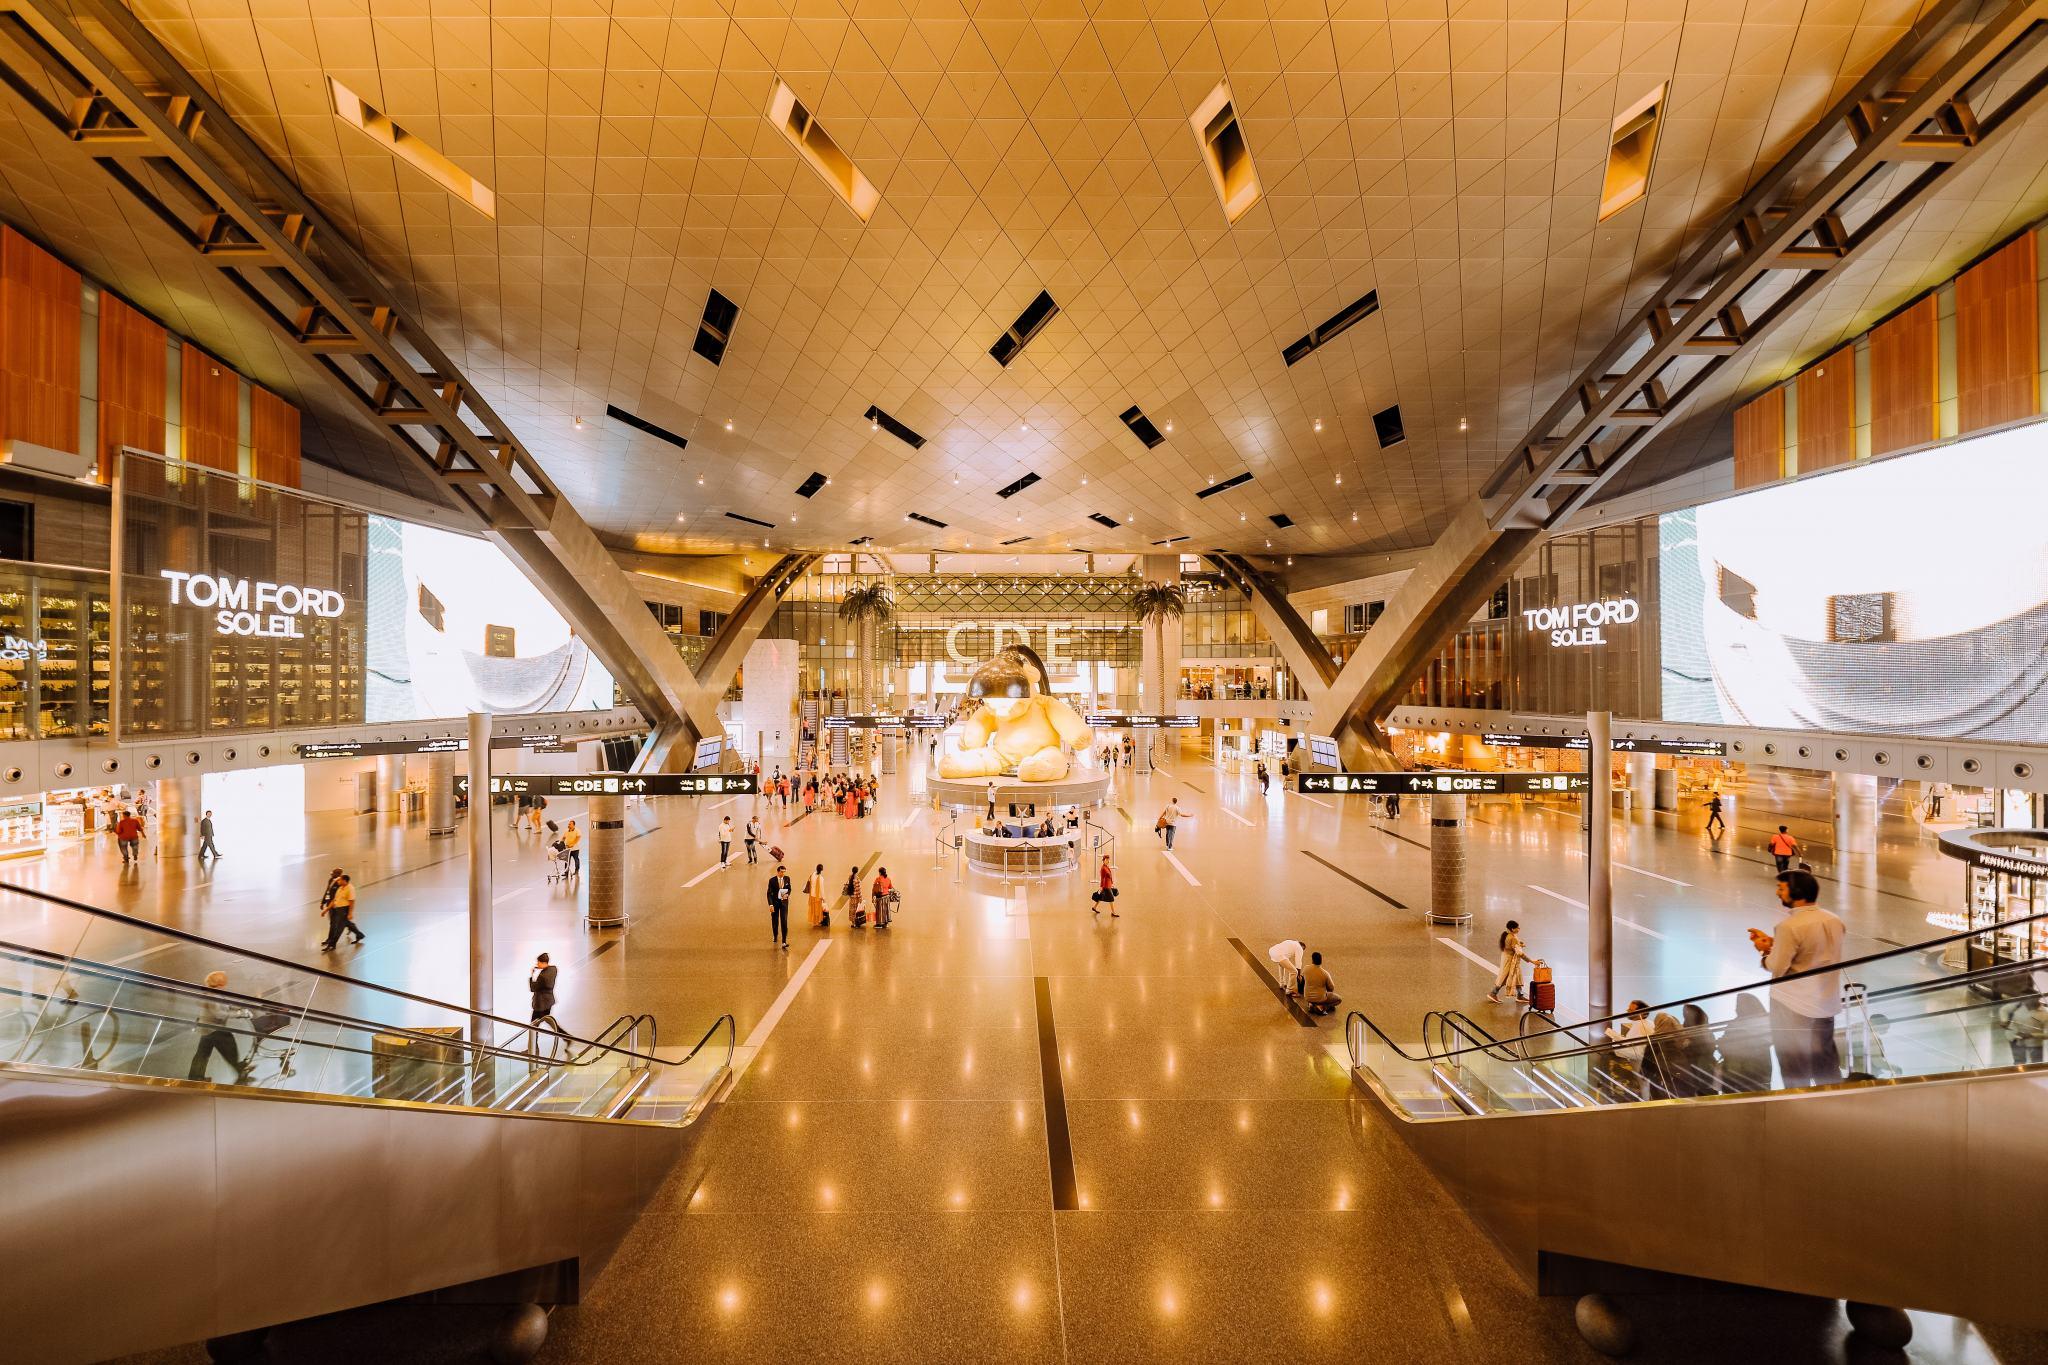 airport-architectural-design-architecture-2610756.jpg